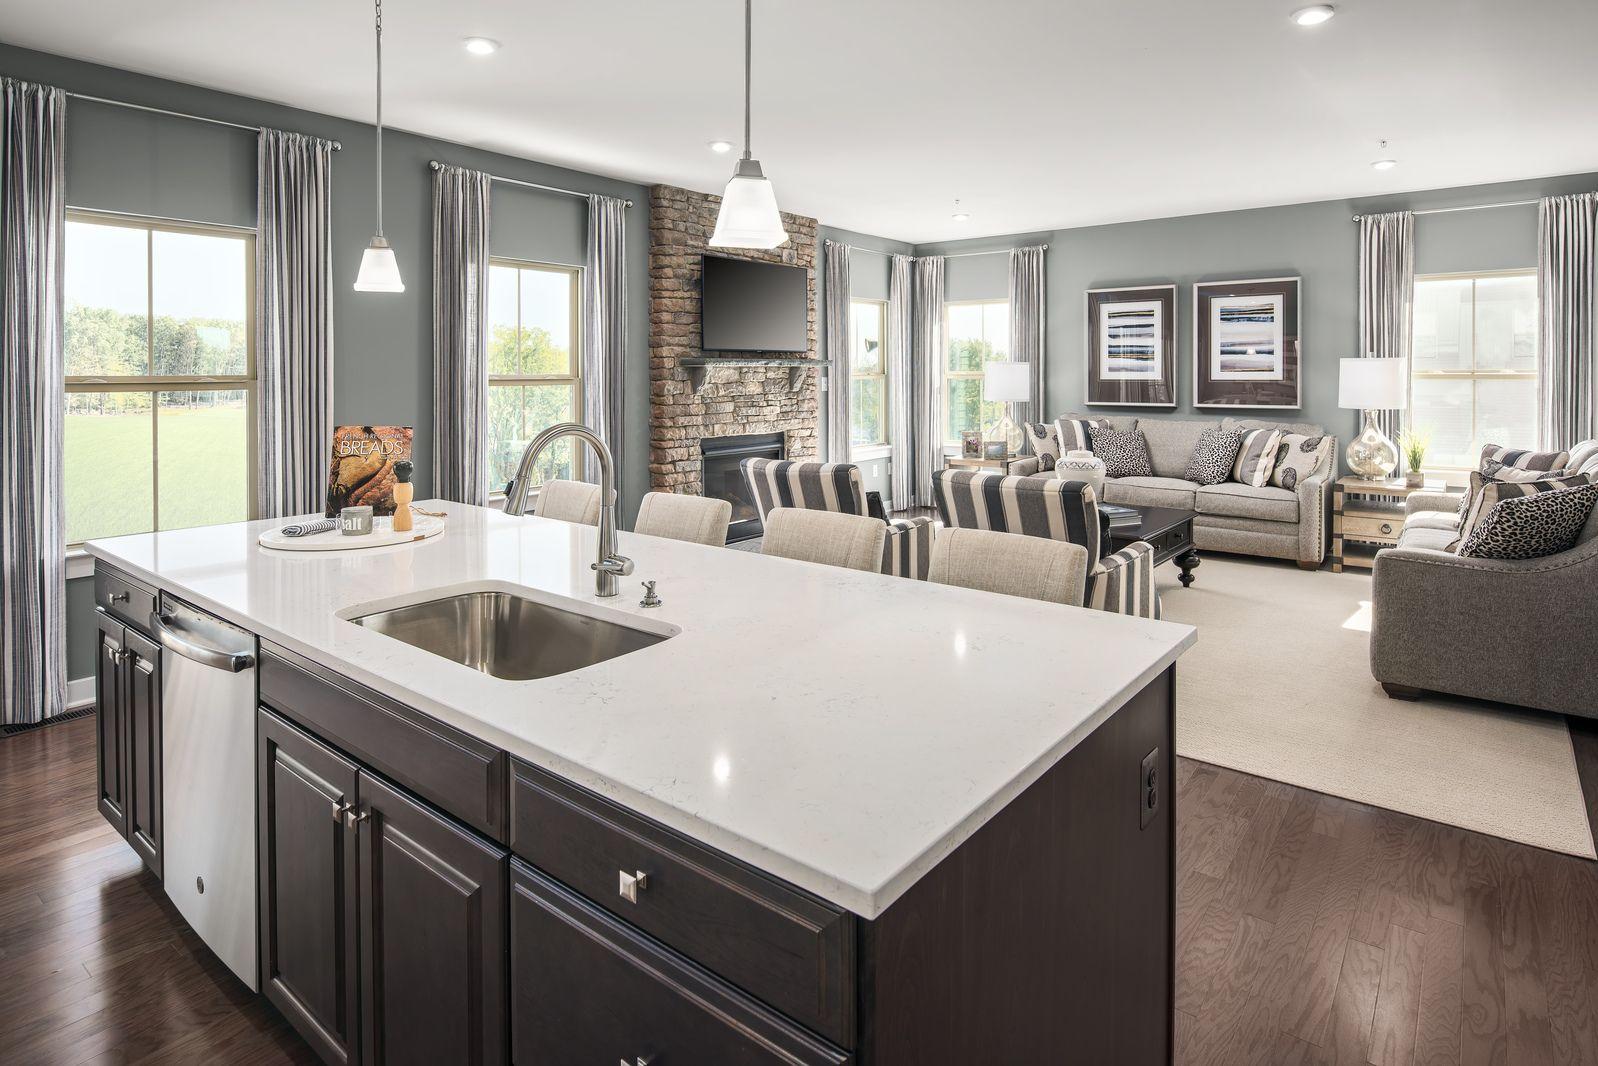 Living Area featured in the Roanoke By Ryan Homes in Philadelphia, NJ